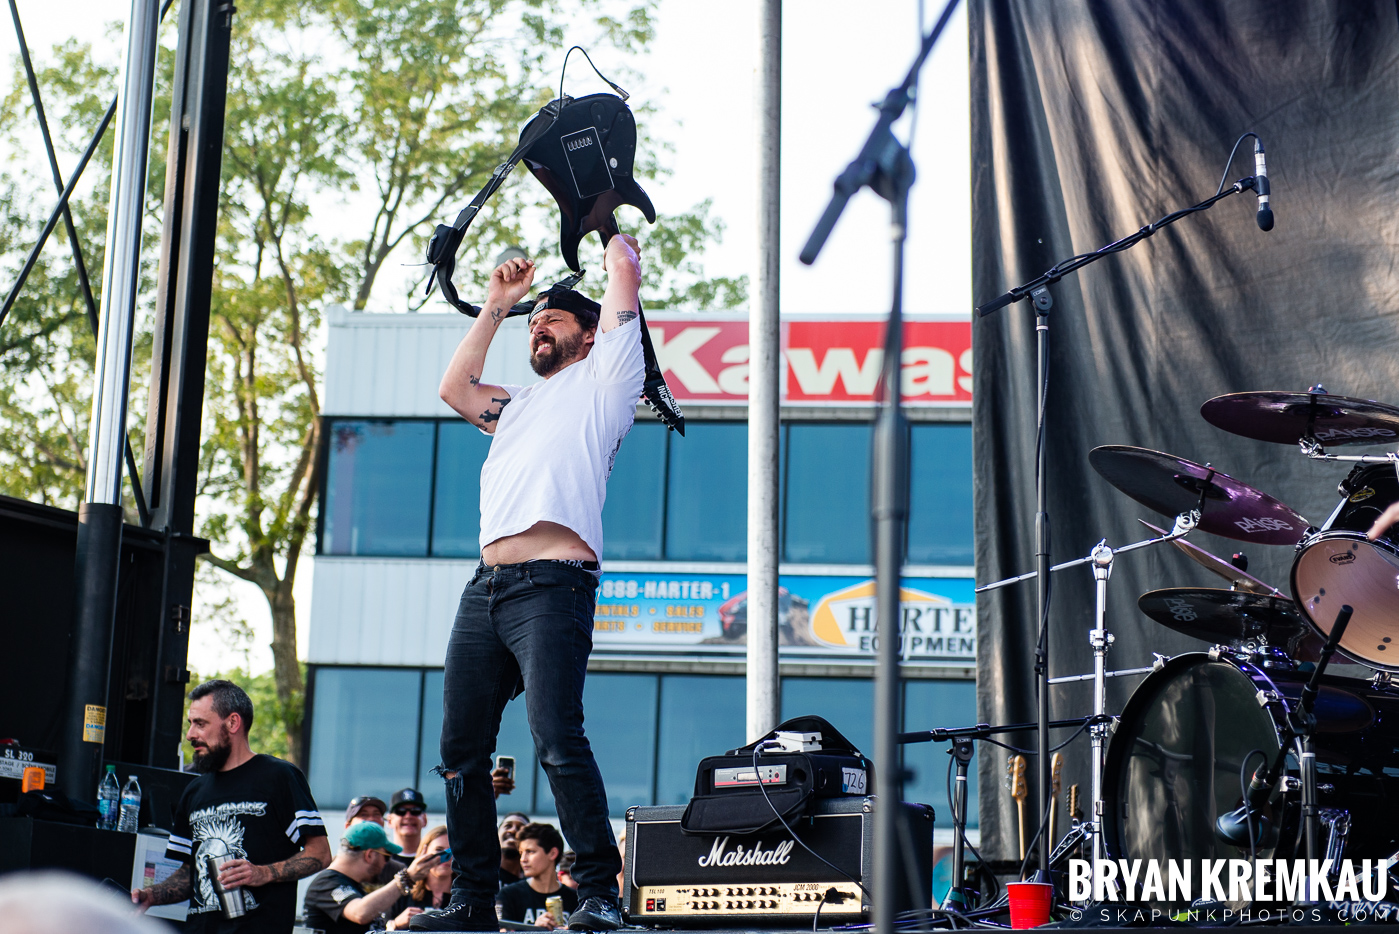 Suicidal Tendencies @ The Bash Music & Craft Beer Festival, Old Bridge Township Raceway Park, Englishtown, NJ - 6.2.19 (48)